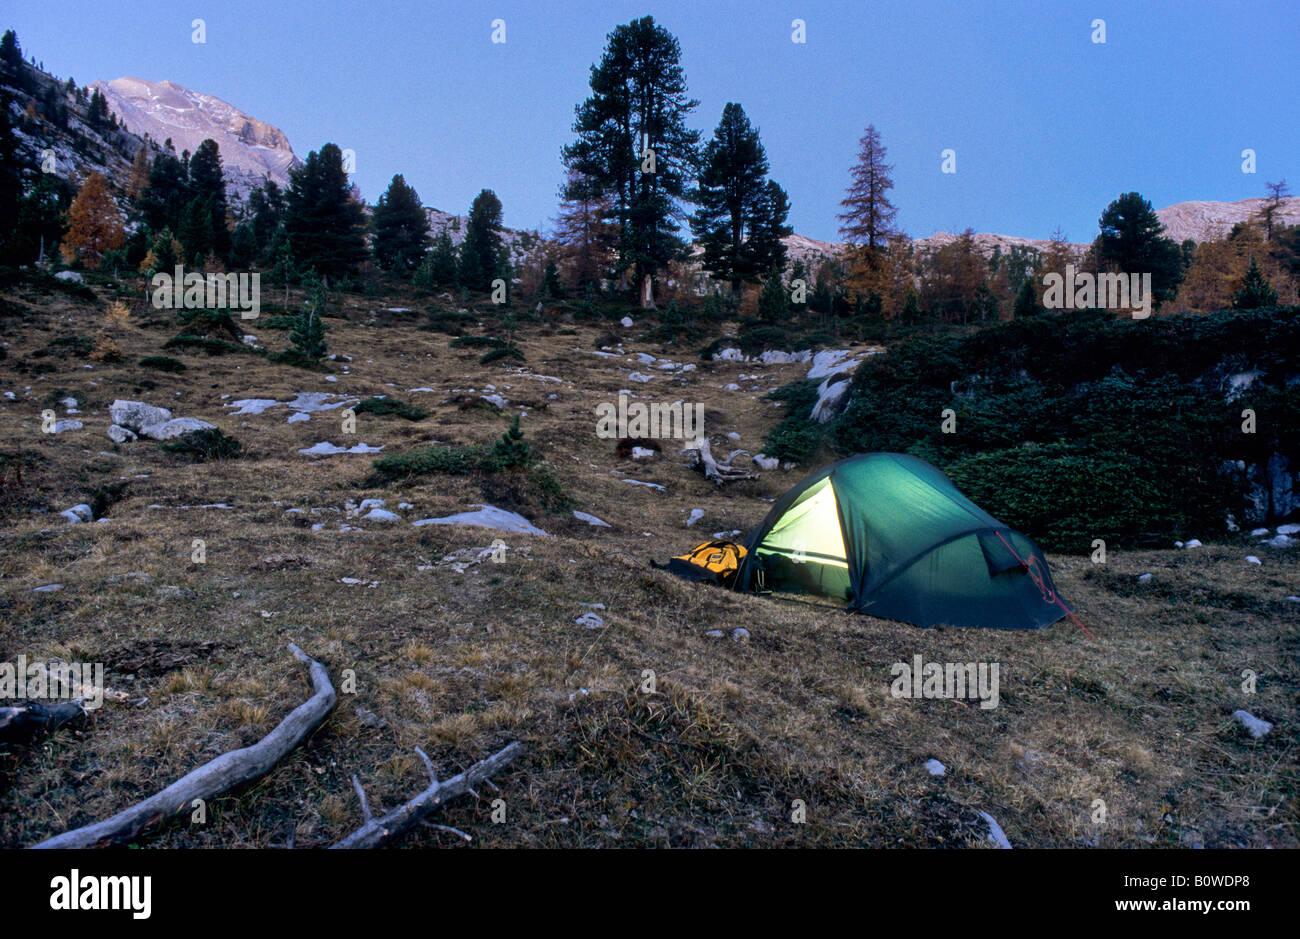 Illuminated tent, twilight, autumnal mountain landscape, Fanes Group, Bolzano-Bozen, Italy, Europe Stock Photo